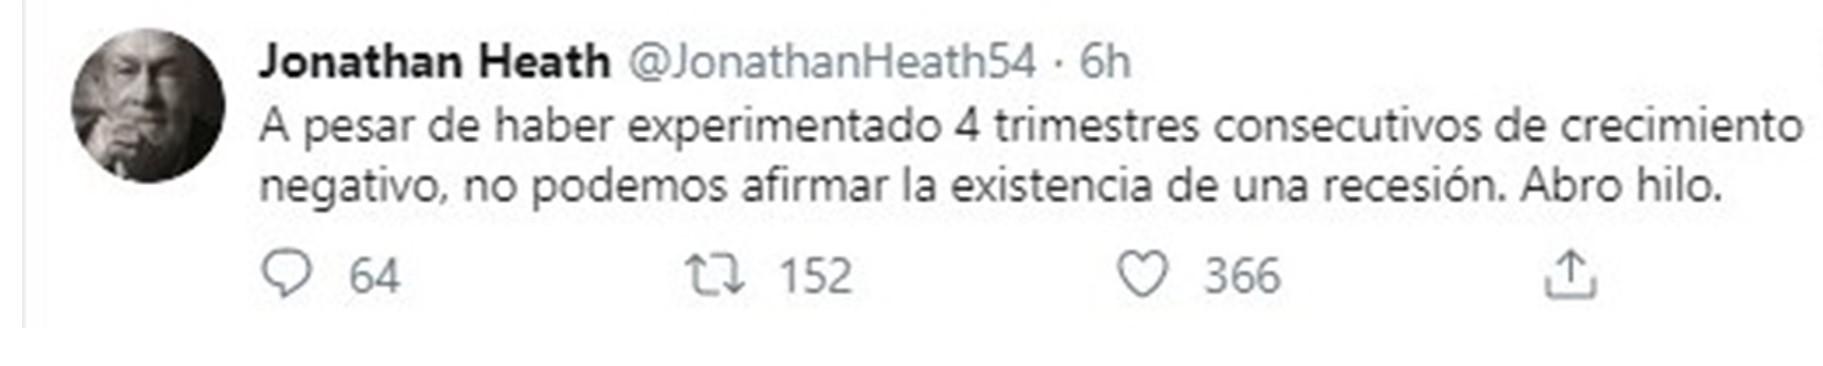 Jonathan Heath (Foto: Twitter@JonathanHeath54)